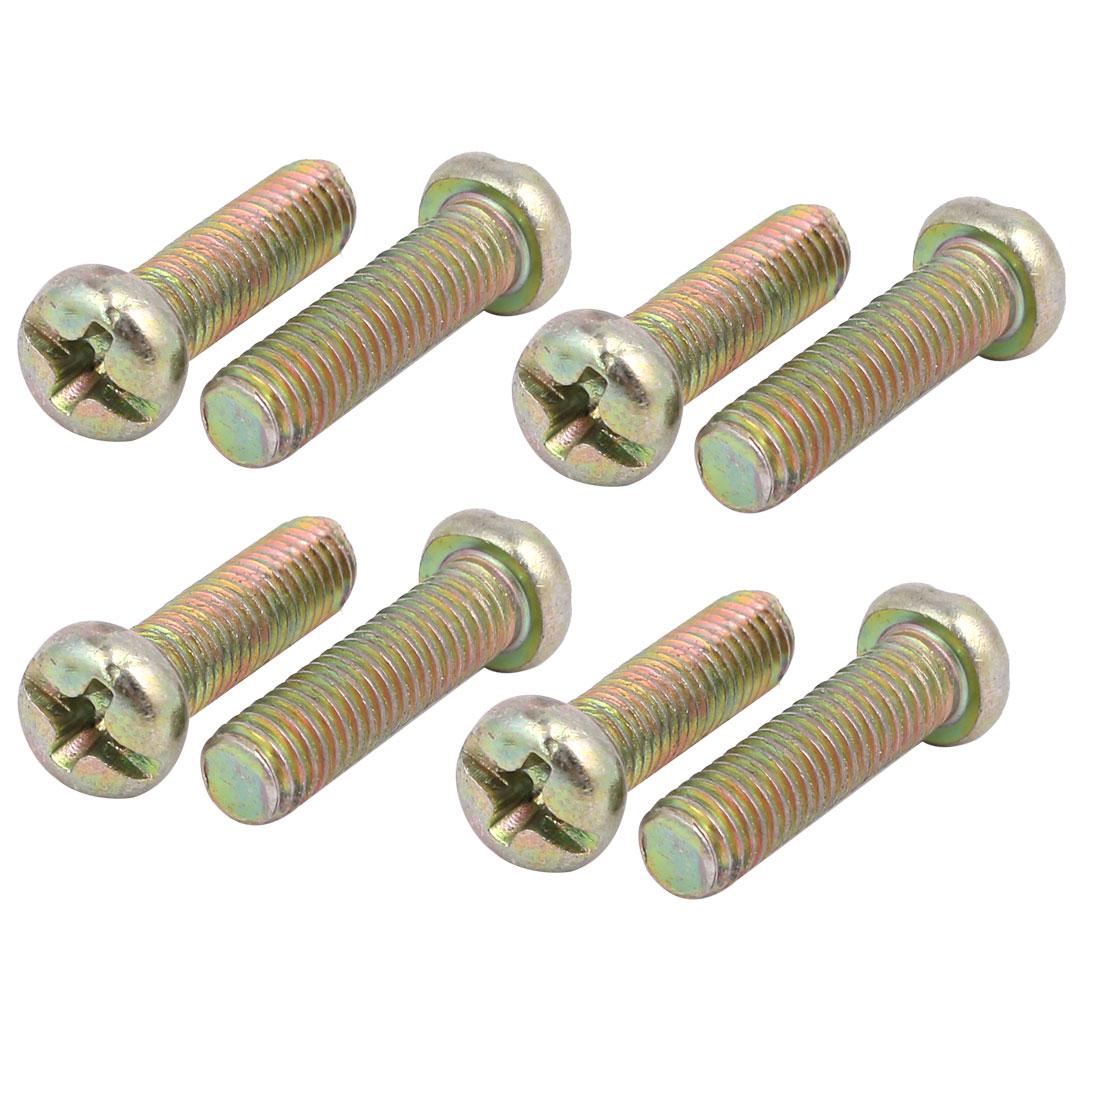 M5x17mm Metal phillips Head Left Hand Thread Screw for Cutting Machine 8pcs